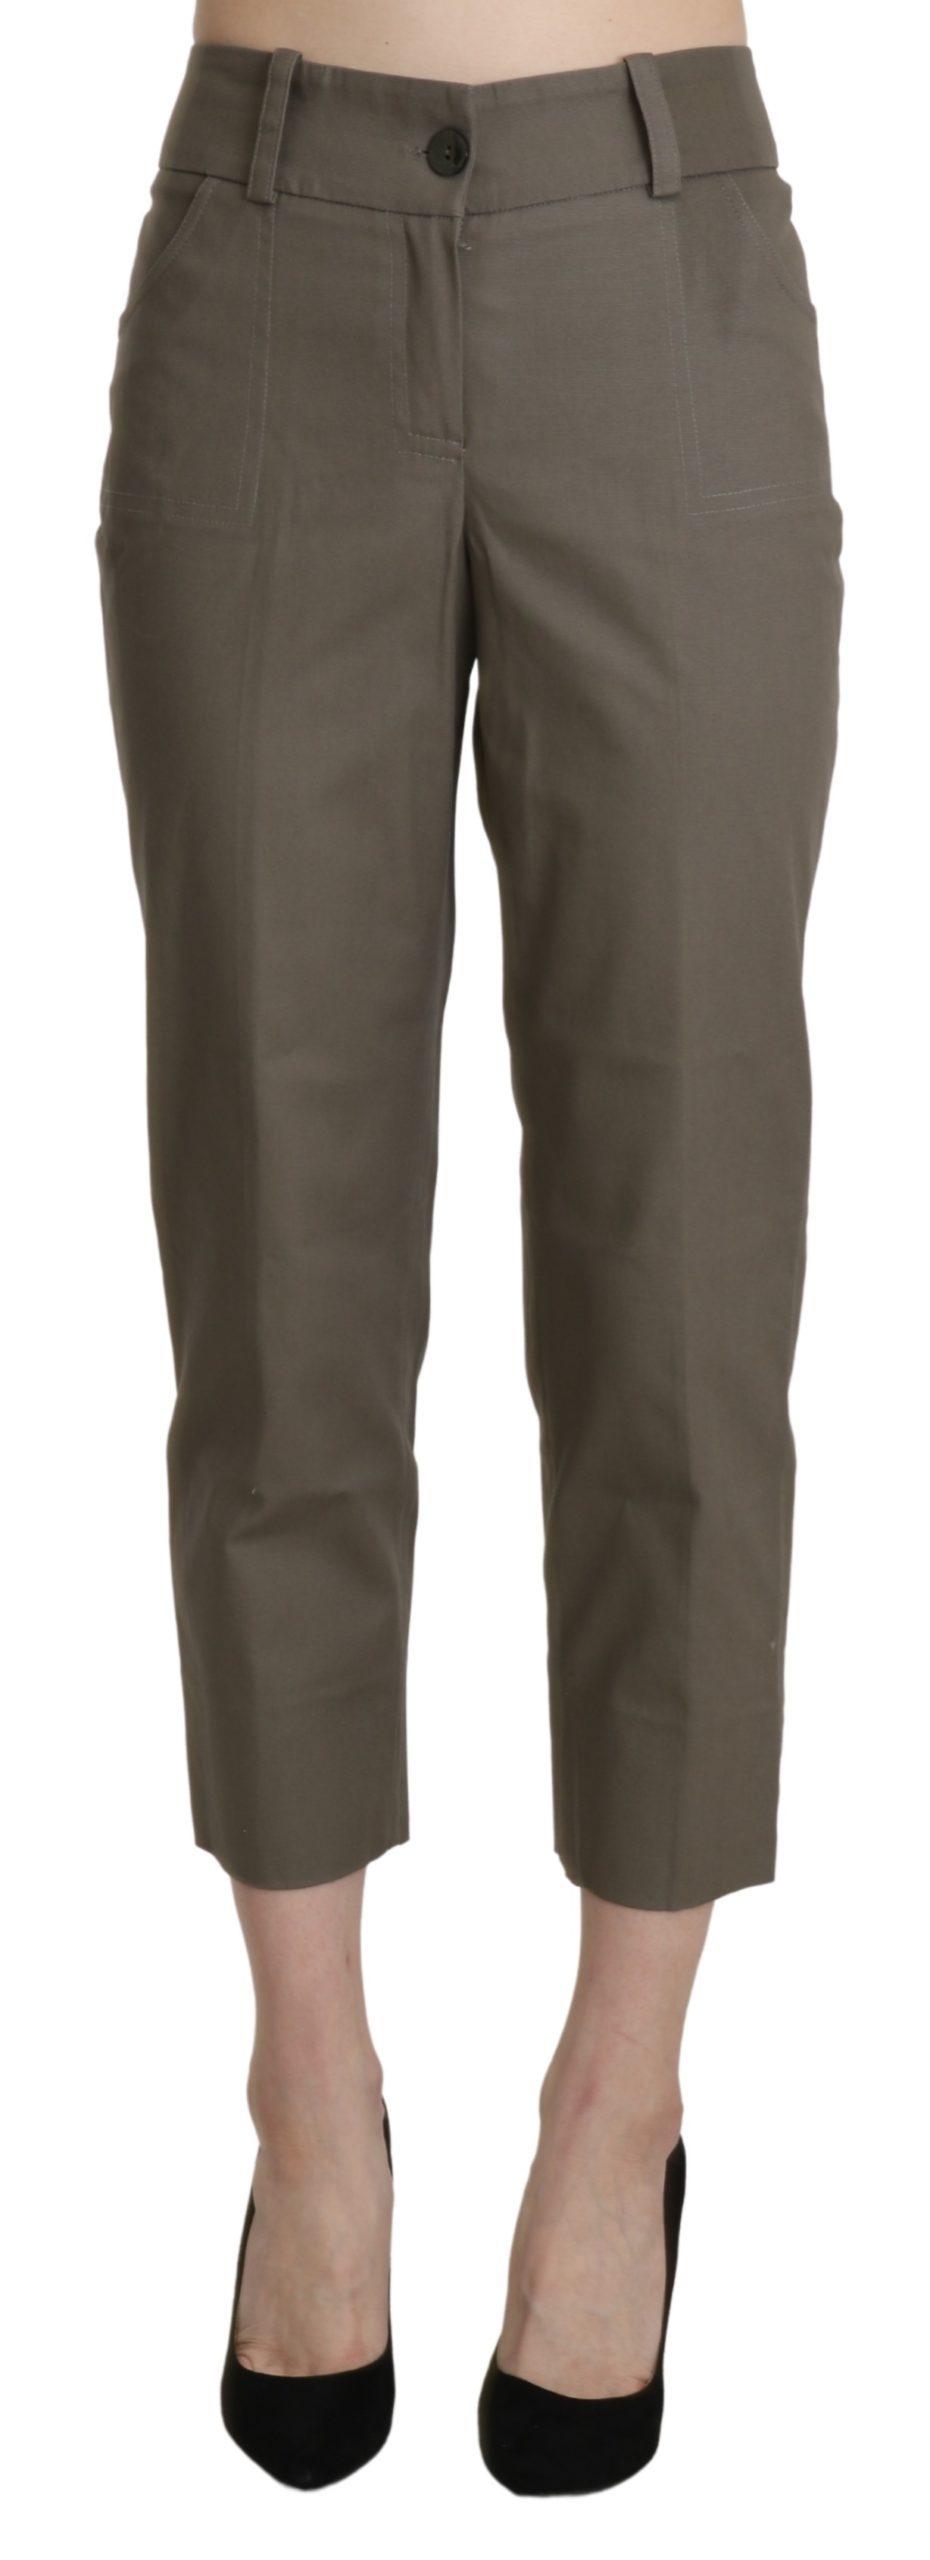 BENCIVENGA Women's High Waist Cropped Trousers Grey PAN71344-46 - IT46|XL